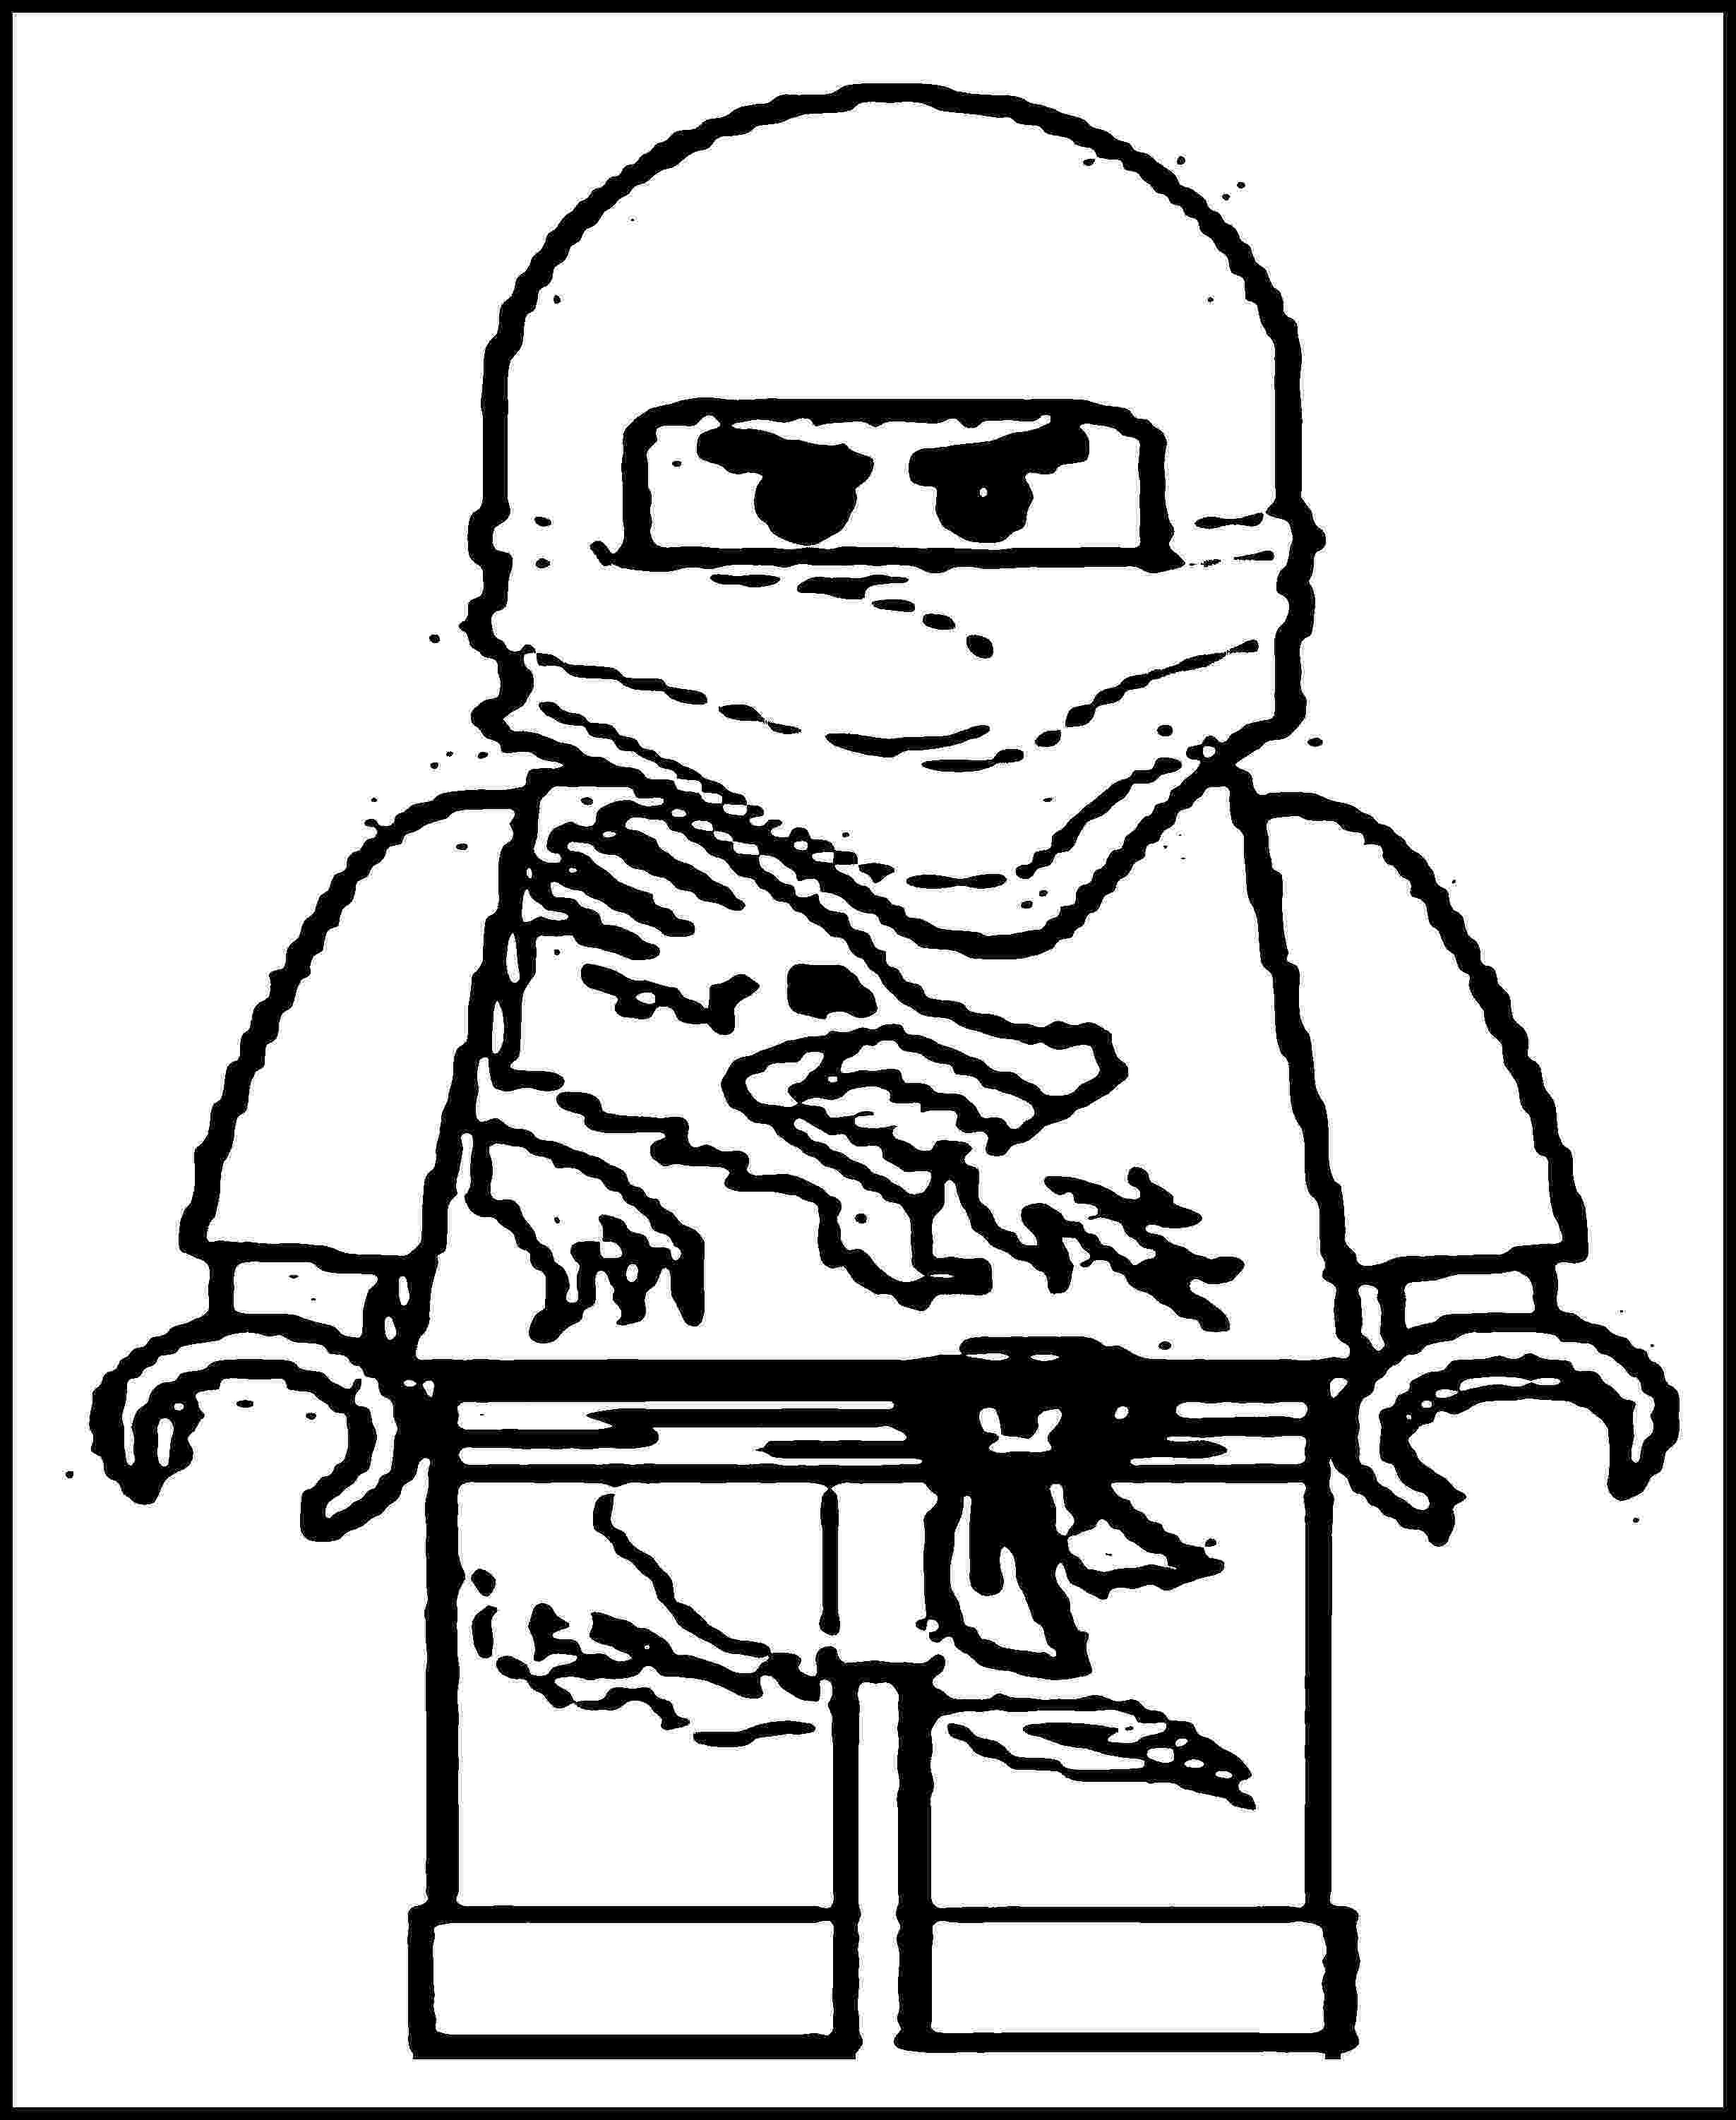 coloring pages ninja craftoholic teenage mutant ninja turtles coloring pages ninja pages coloring